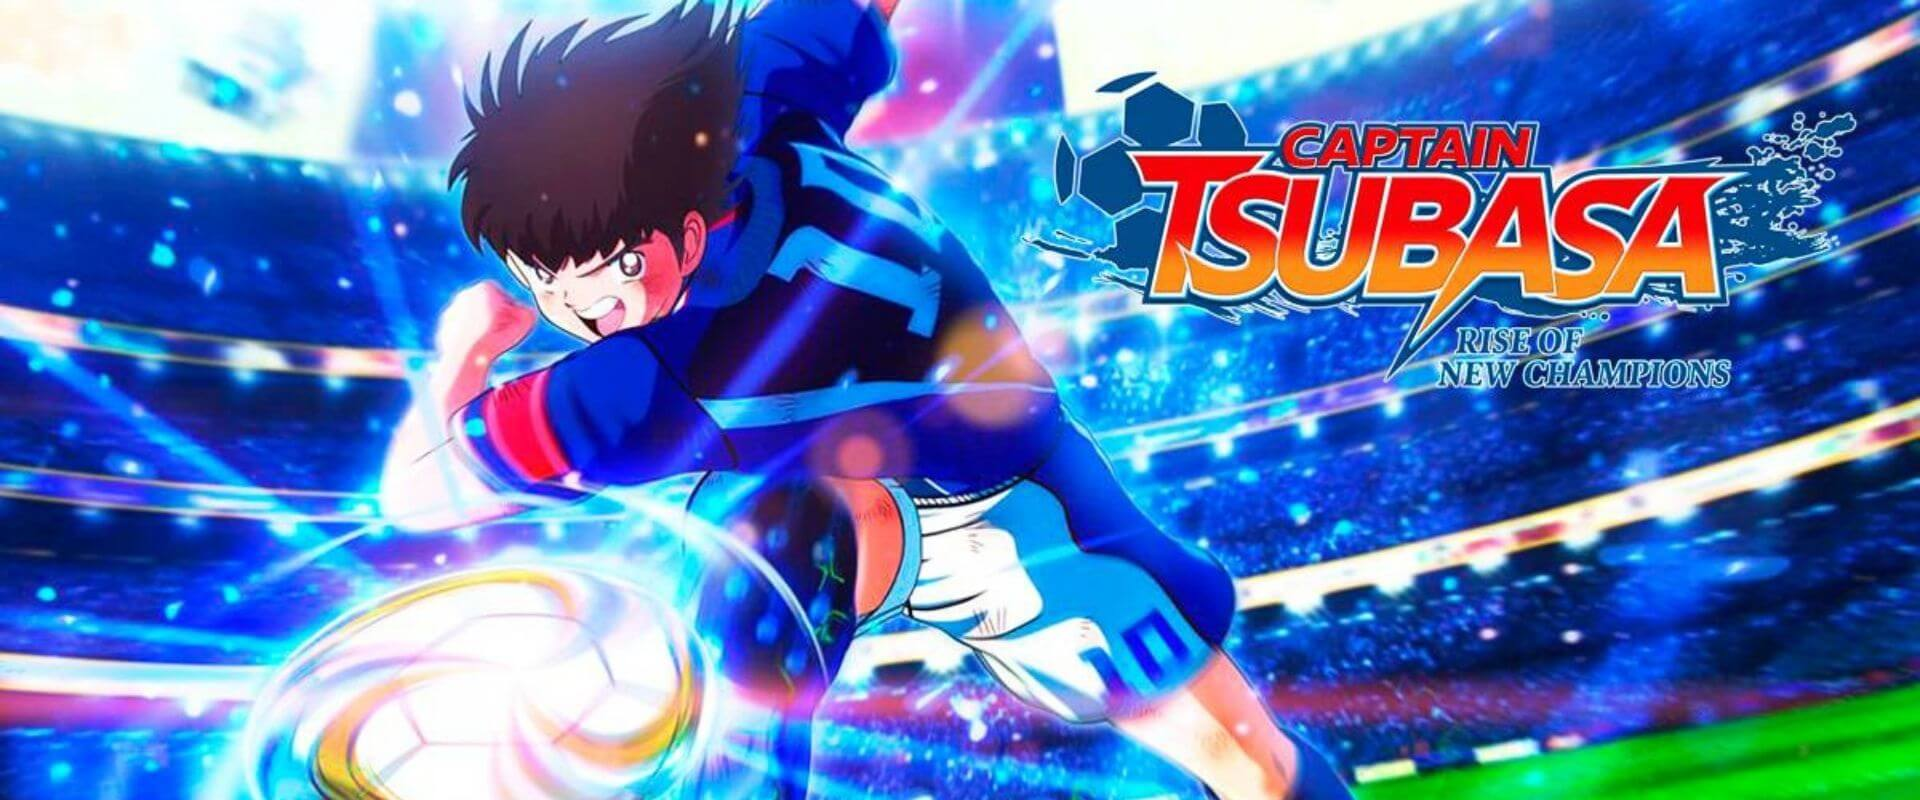 Captain Tsubasa: Rise of Champions